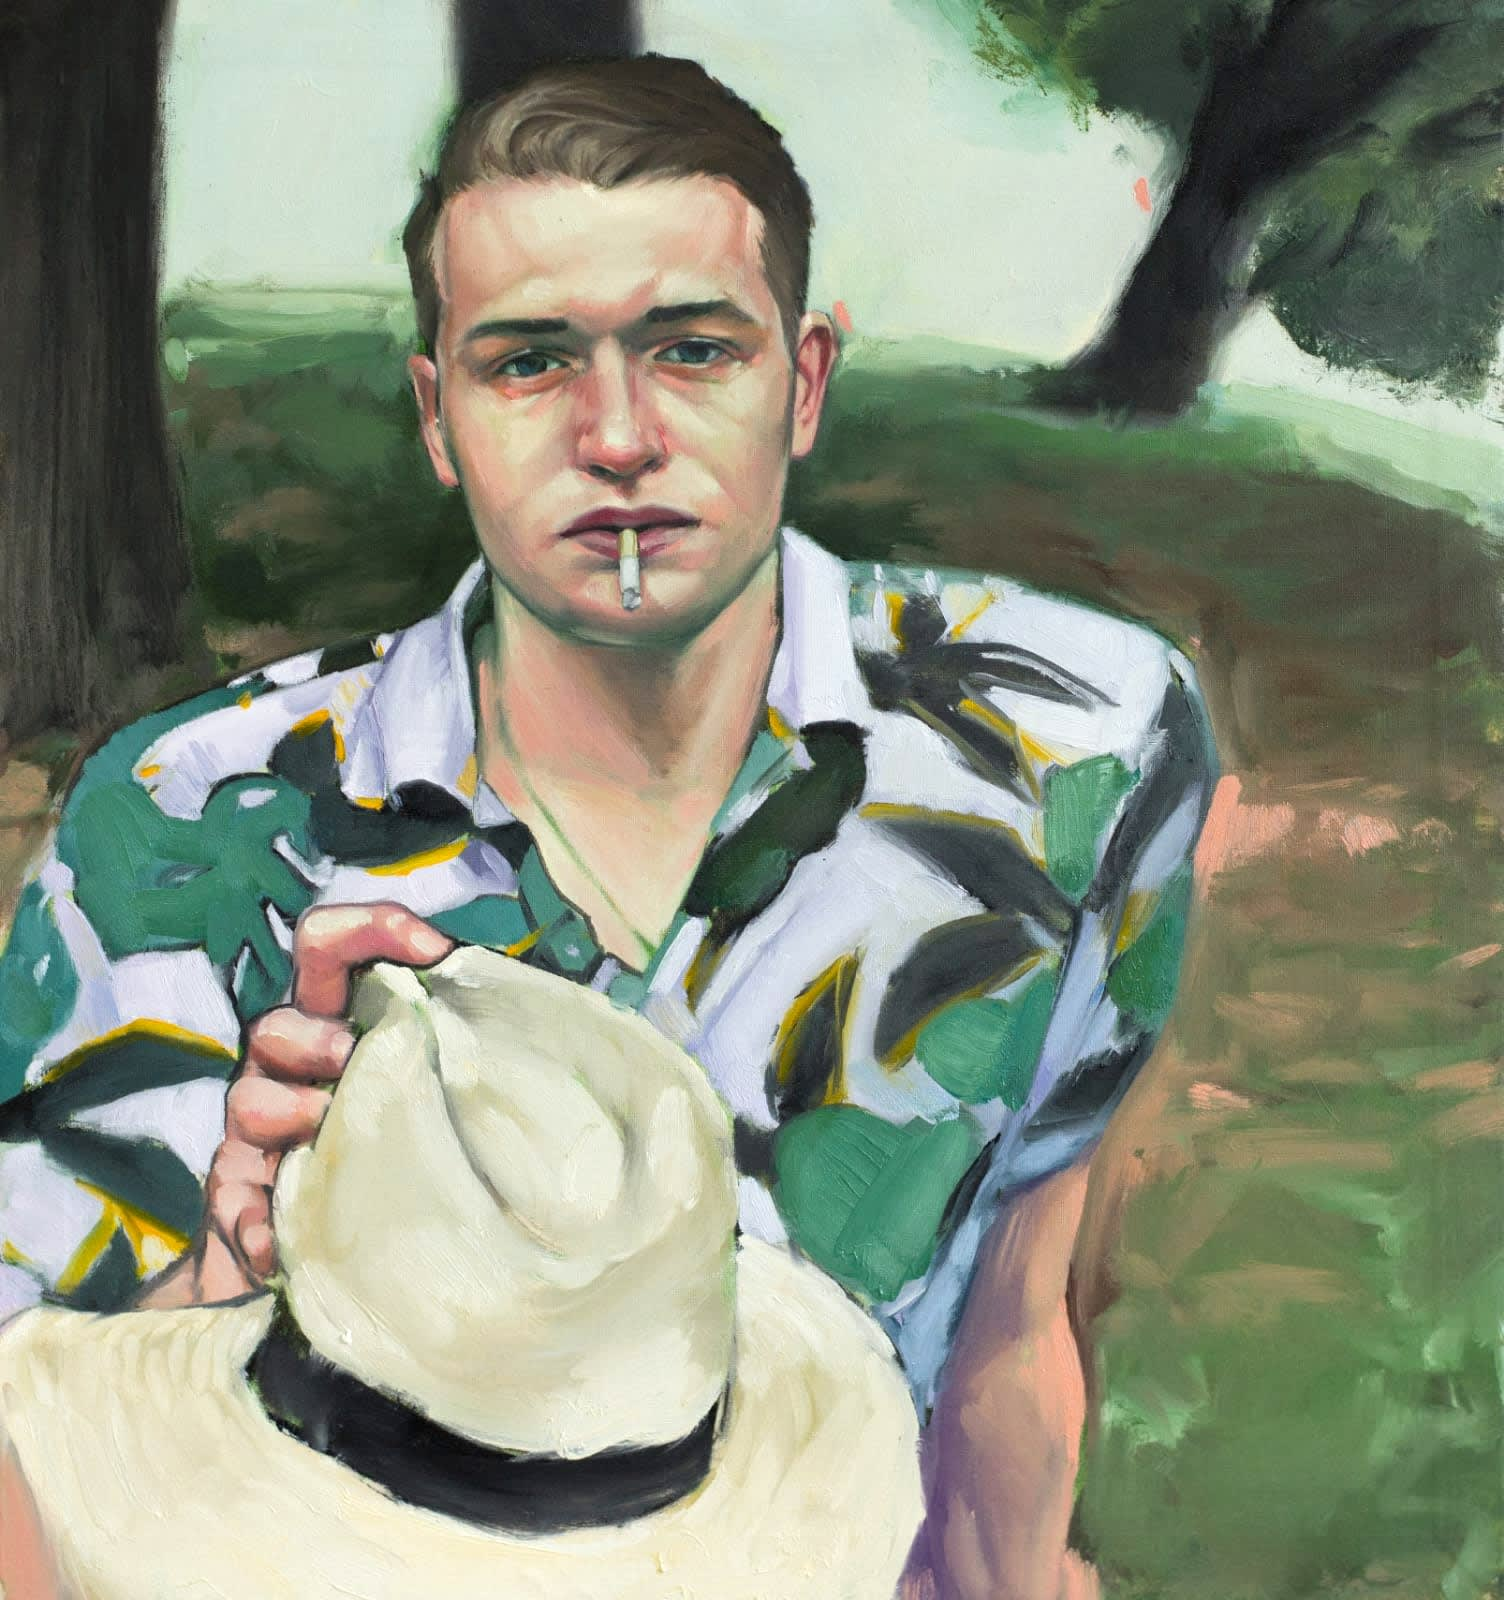 Shane Berkery Study for a winning portrait Oil on canvas 42 x 42 cm